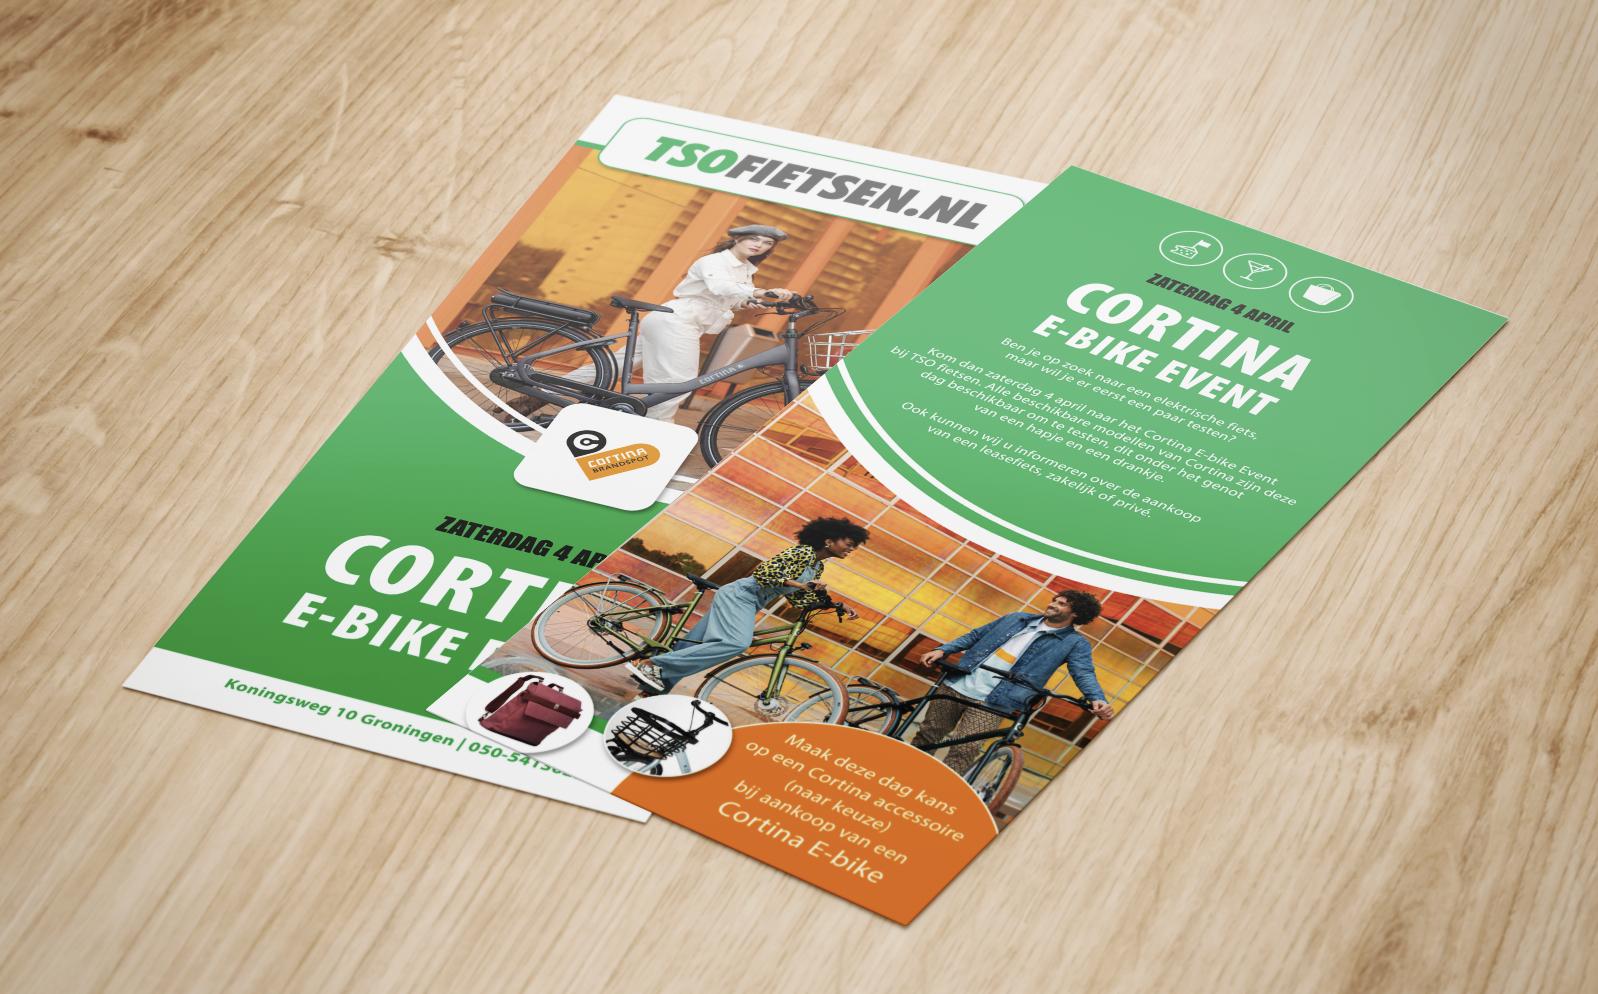 TSO flyer cortina e-bike events